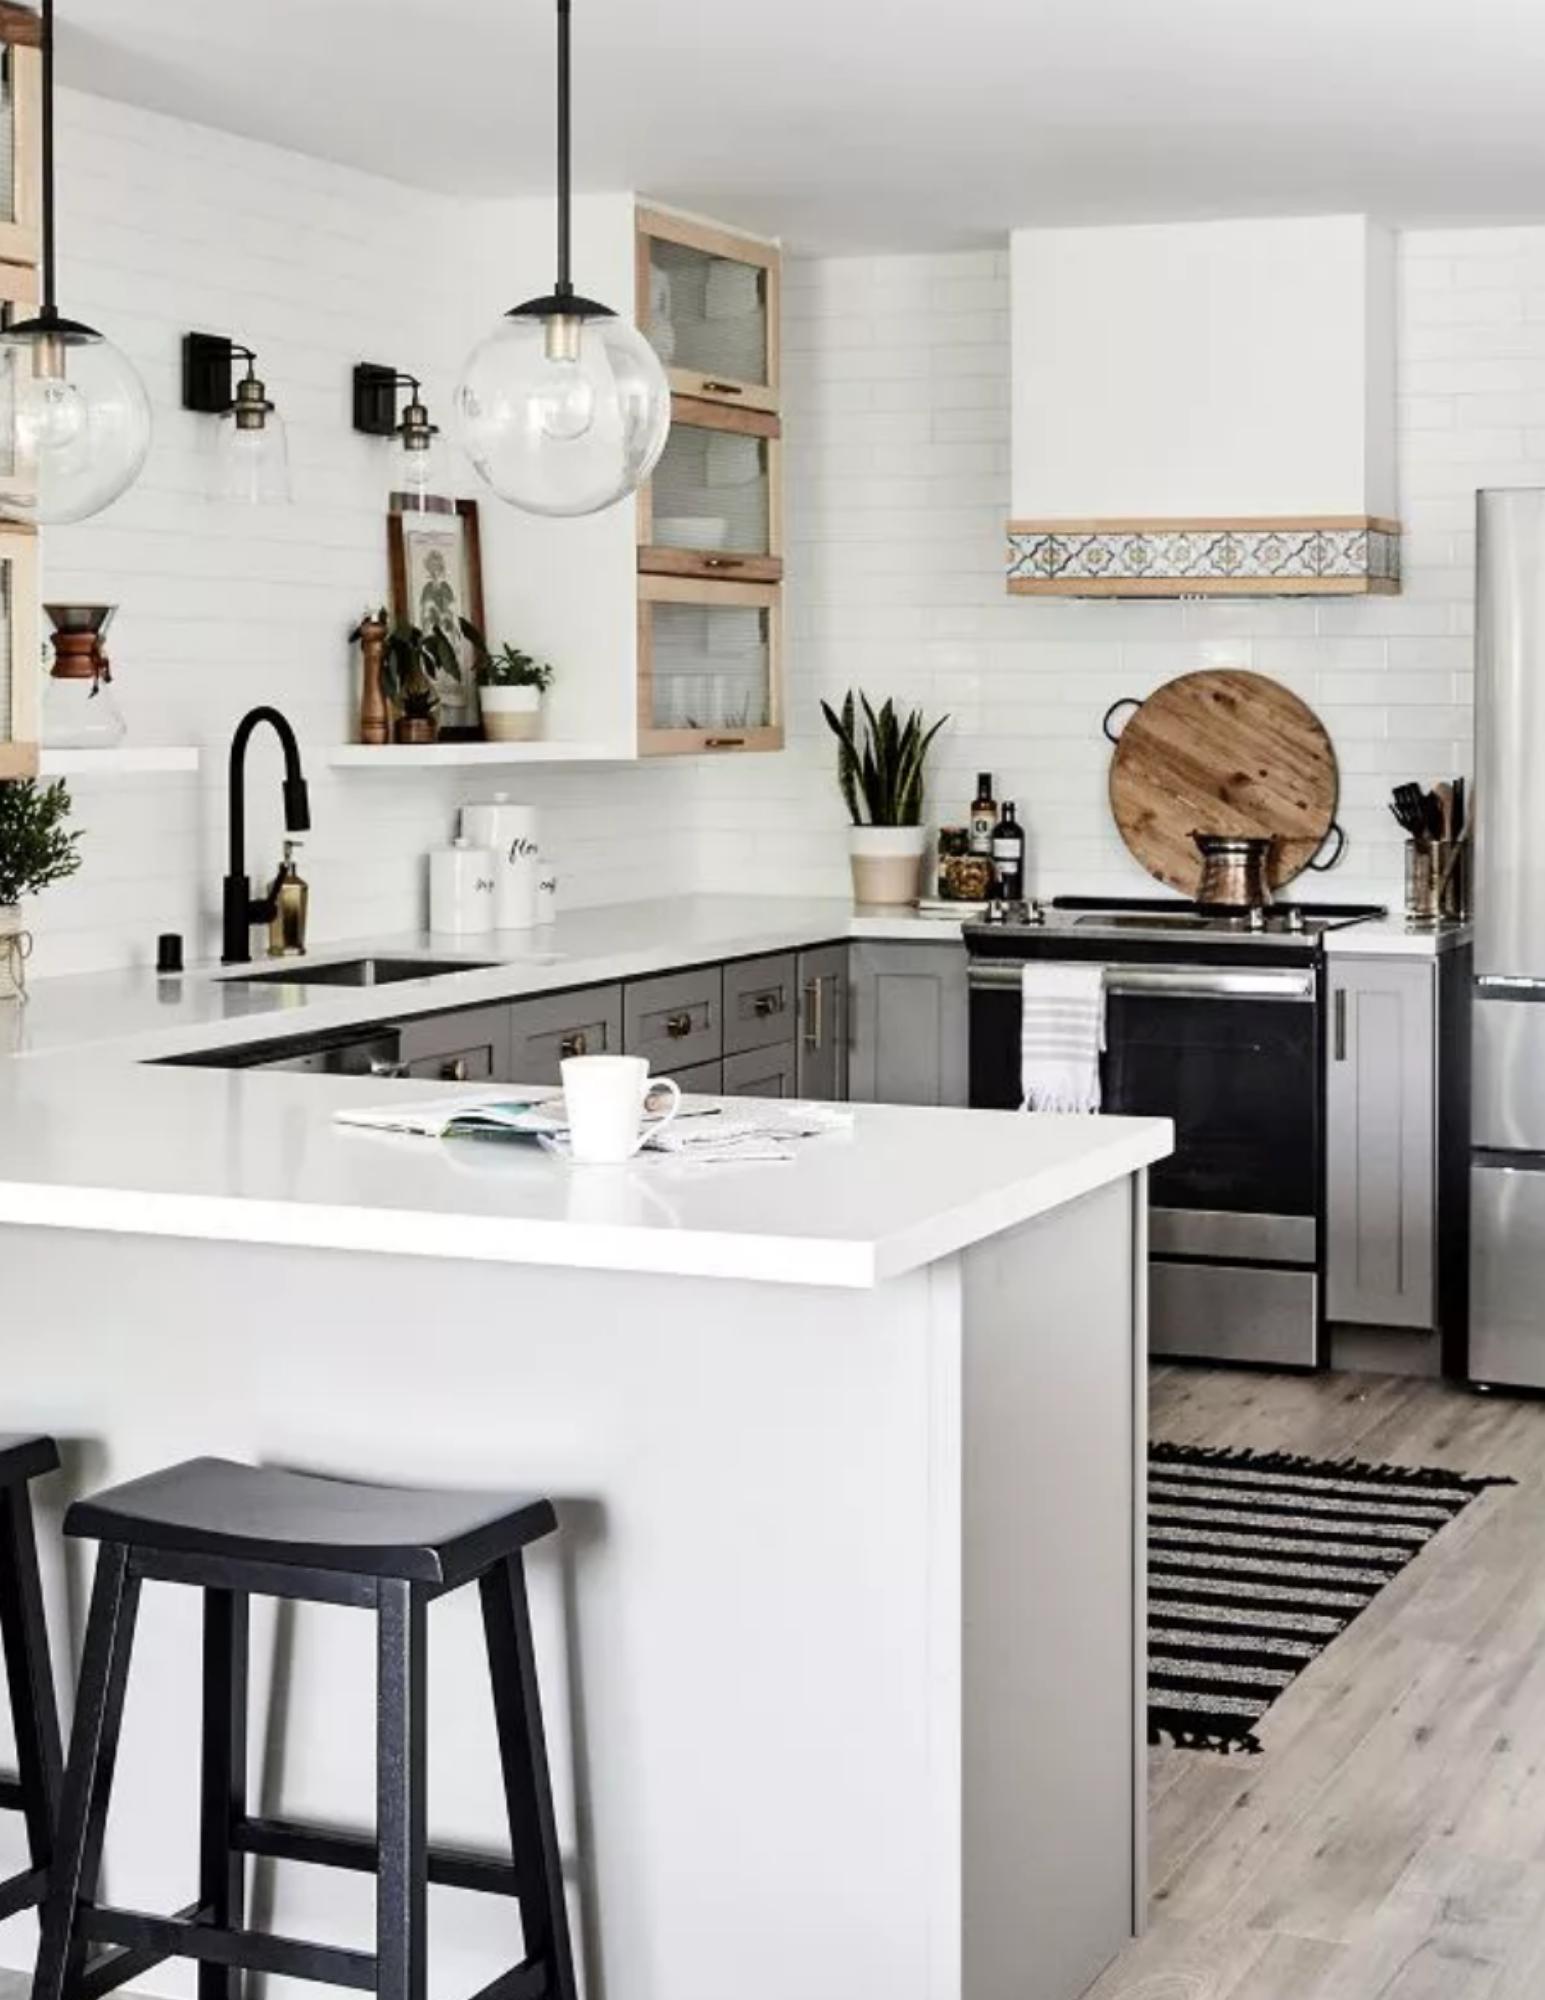 8 Kitchen Trend of 8 - Slice of Design  Interior design